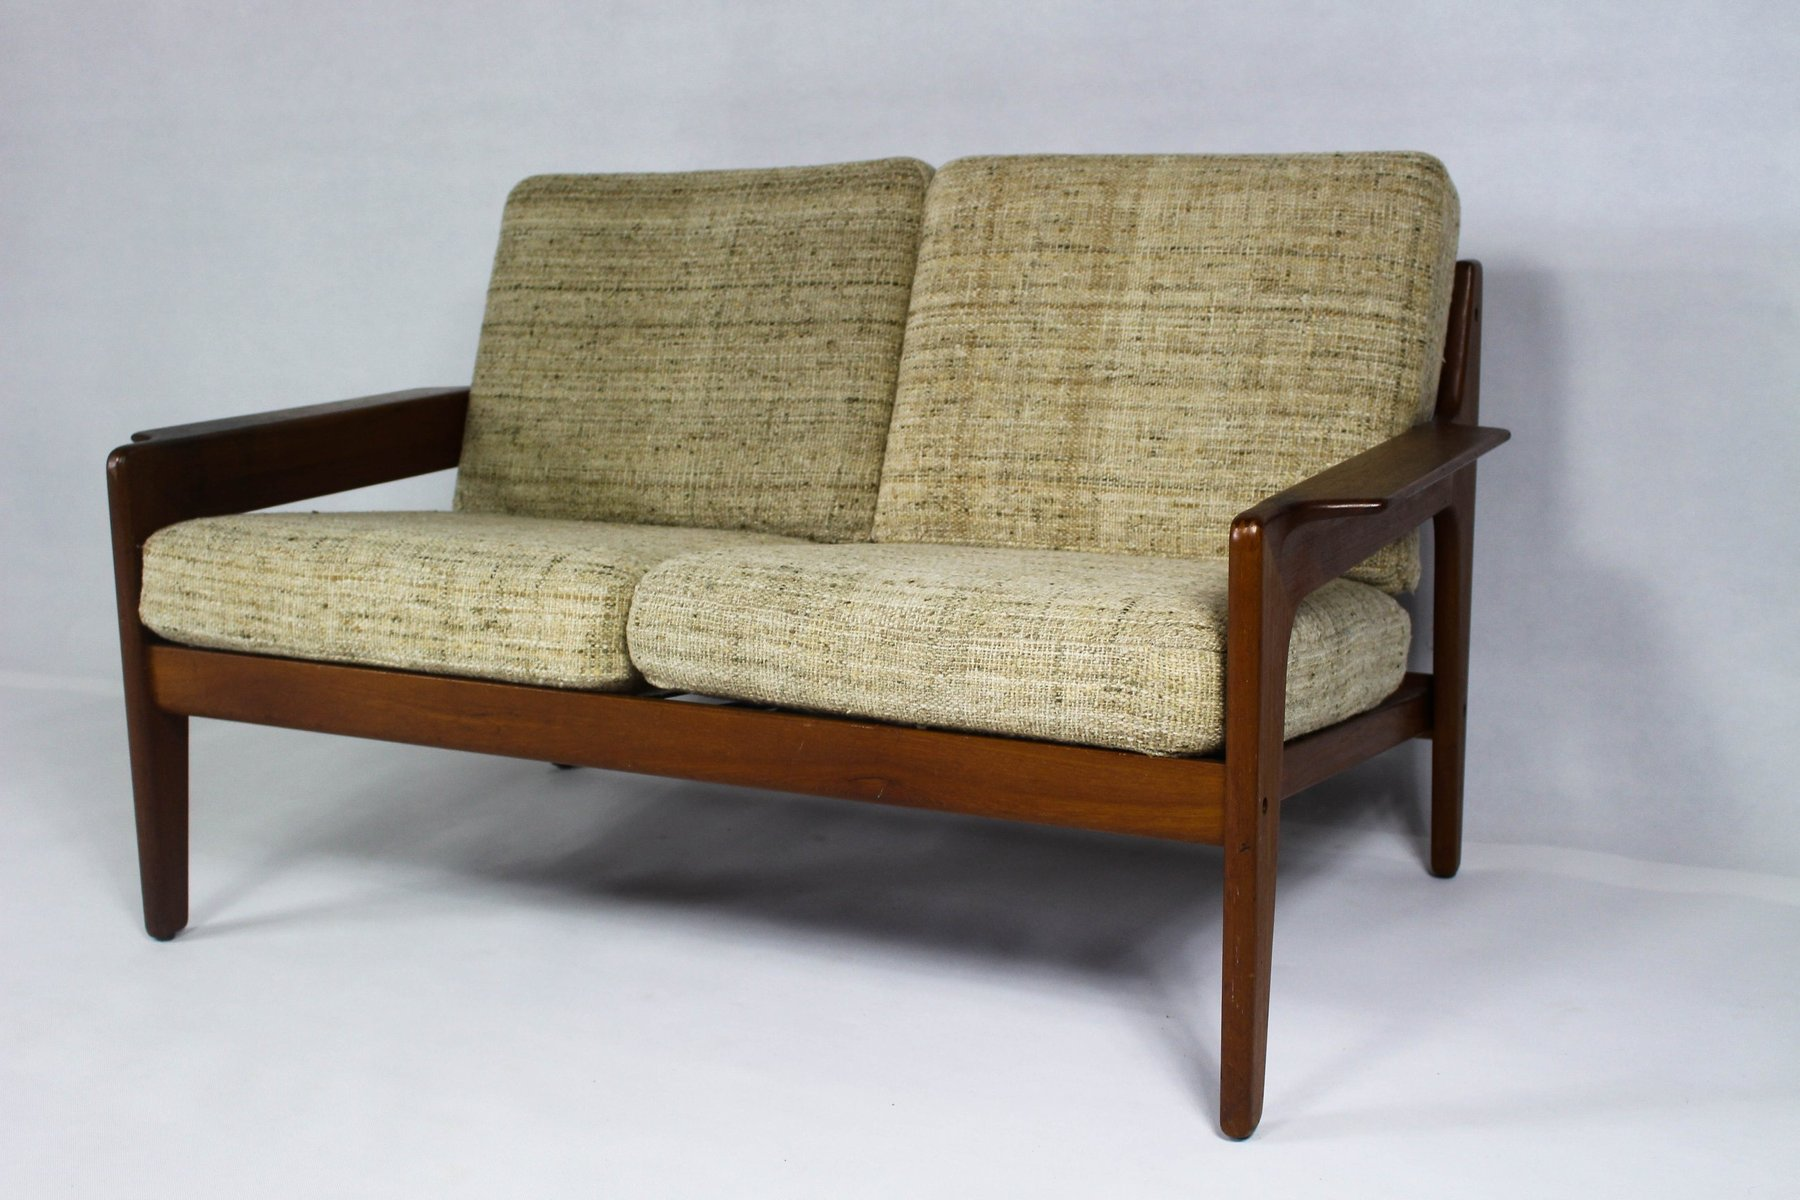 Vintage Danish Beige Teak Sofa by Arne Wahl Iversen for Komfort